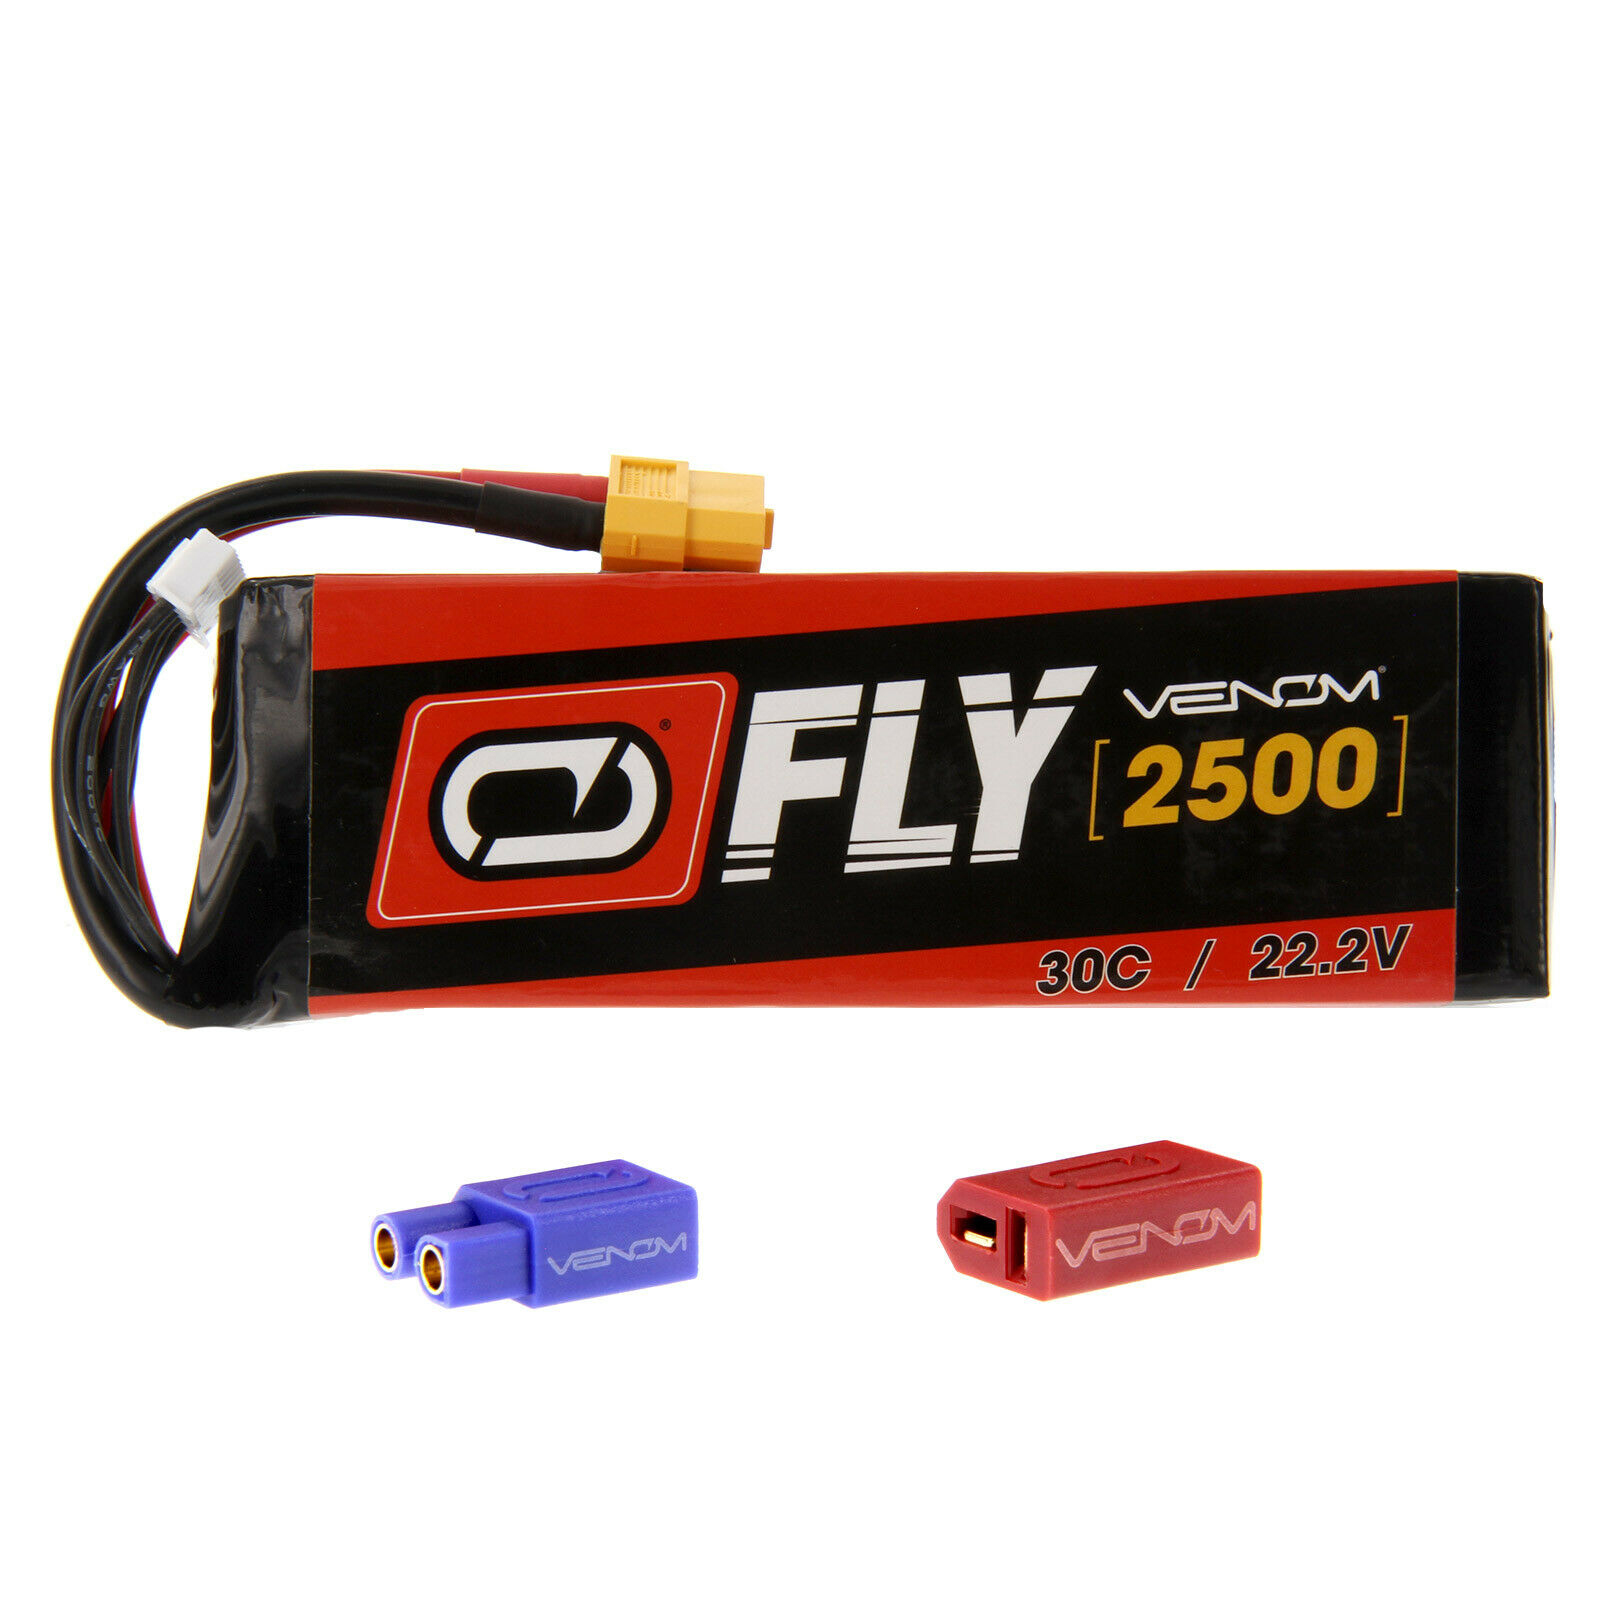 Mikado Logo 400 30C 6S 2500mAh 22.2V batería LiPo con UNI 2.0 Enchufe por Venom